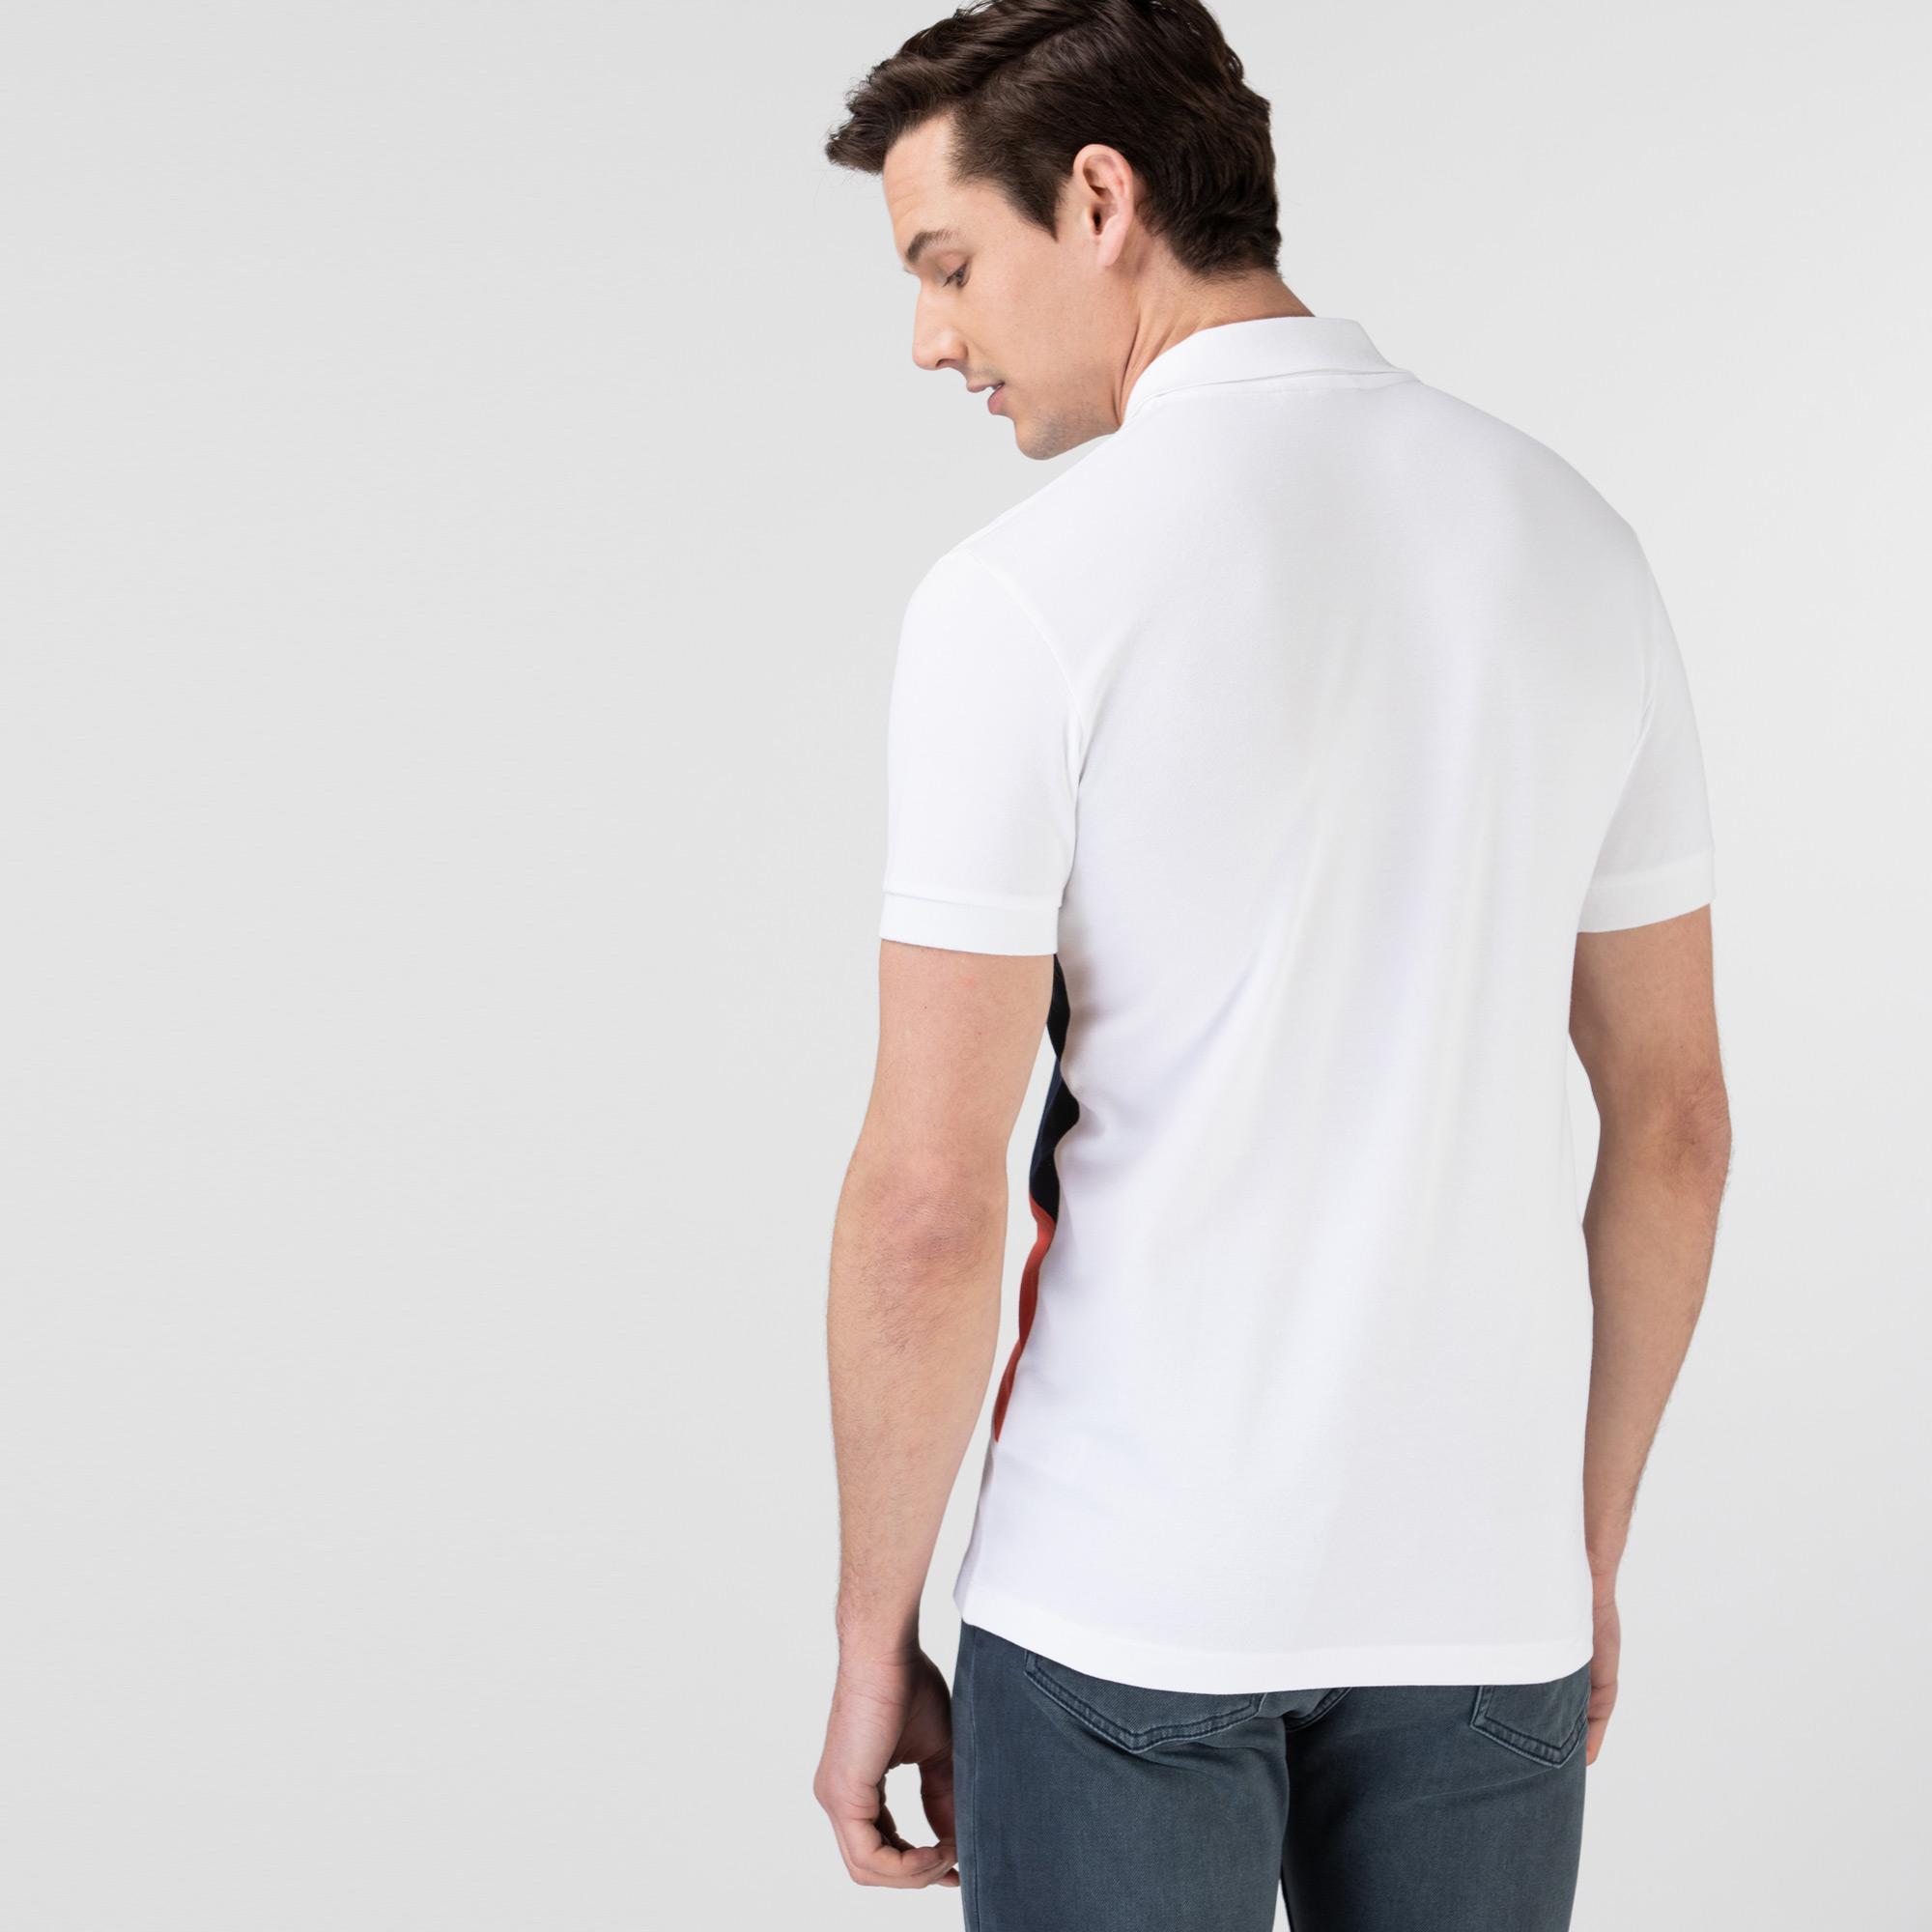 Lacoste Erkek Slim Fit Renk Bloklu Beyaz Polo